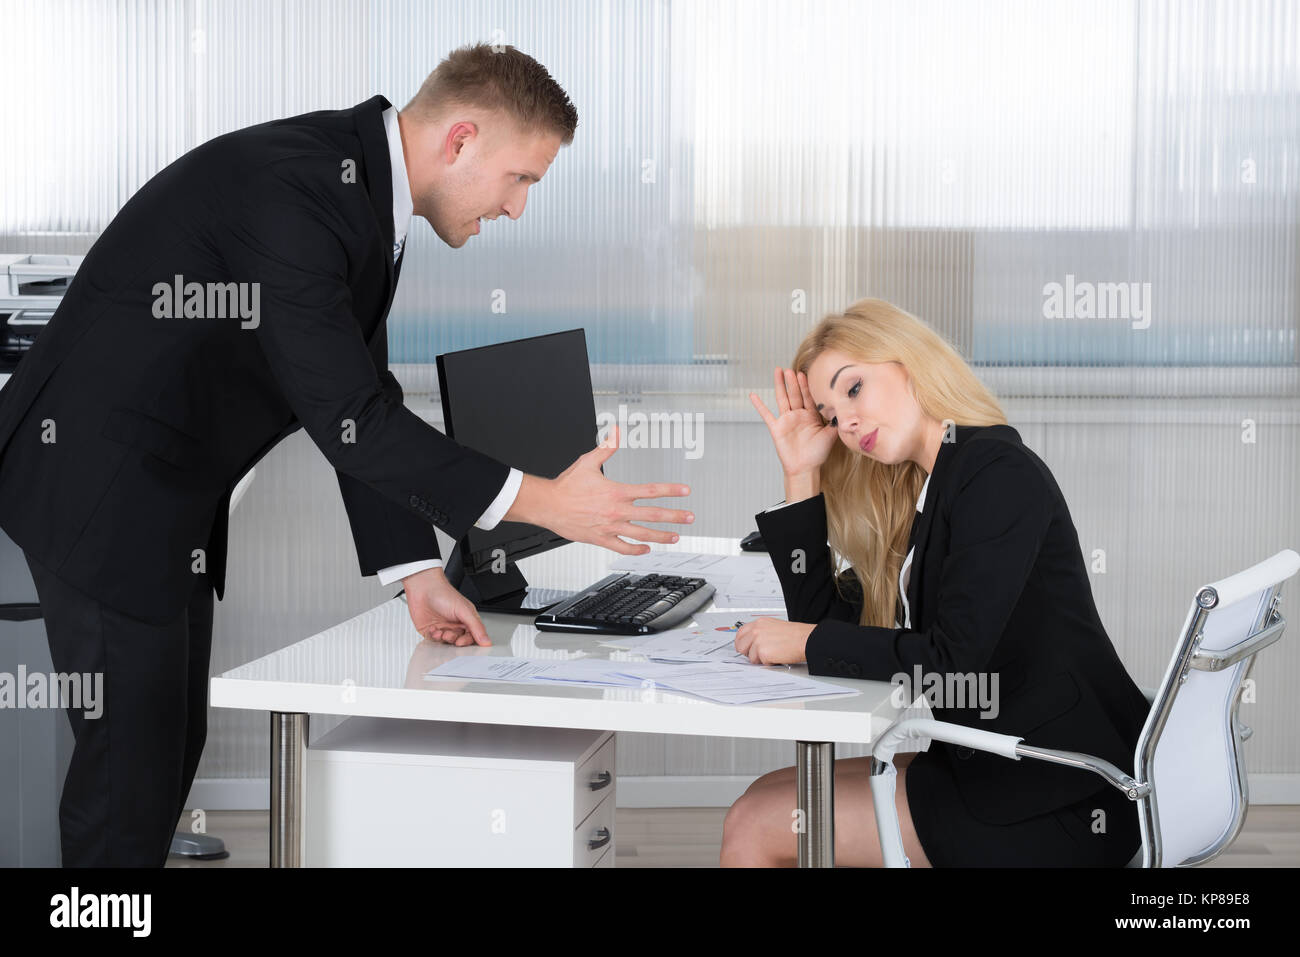 Boss Shouting At Employee Sitting At Desk - Stock Image